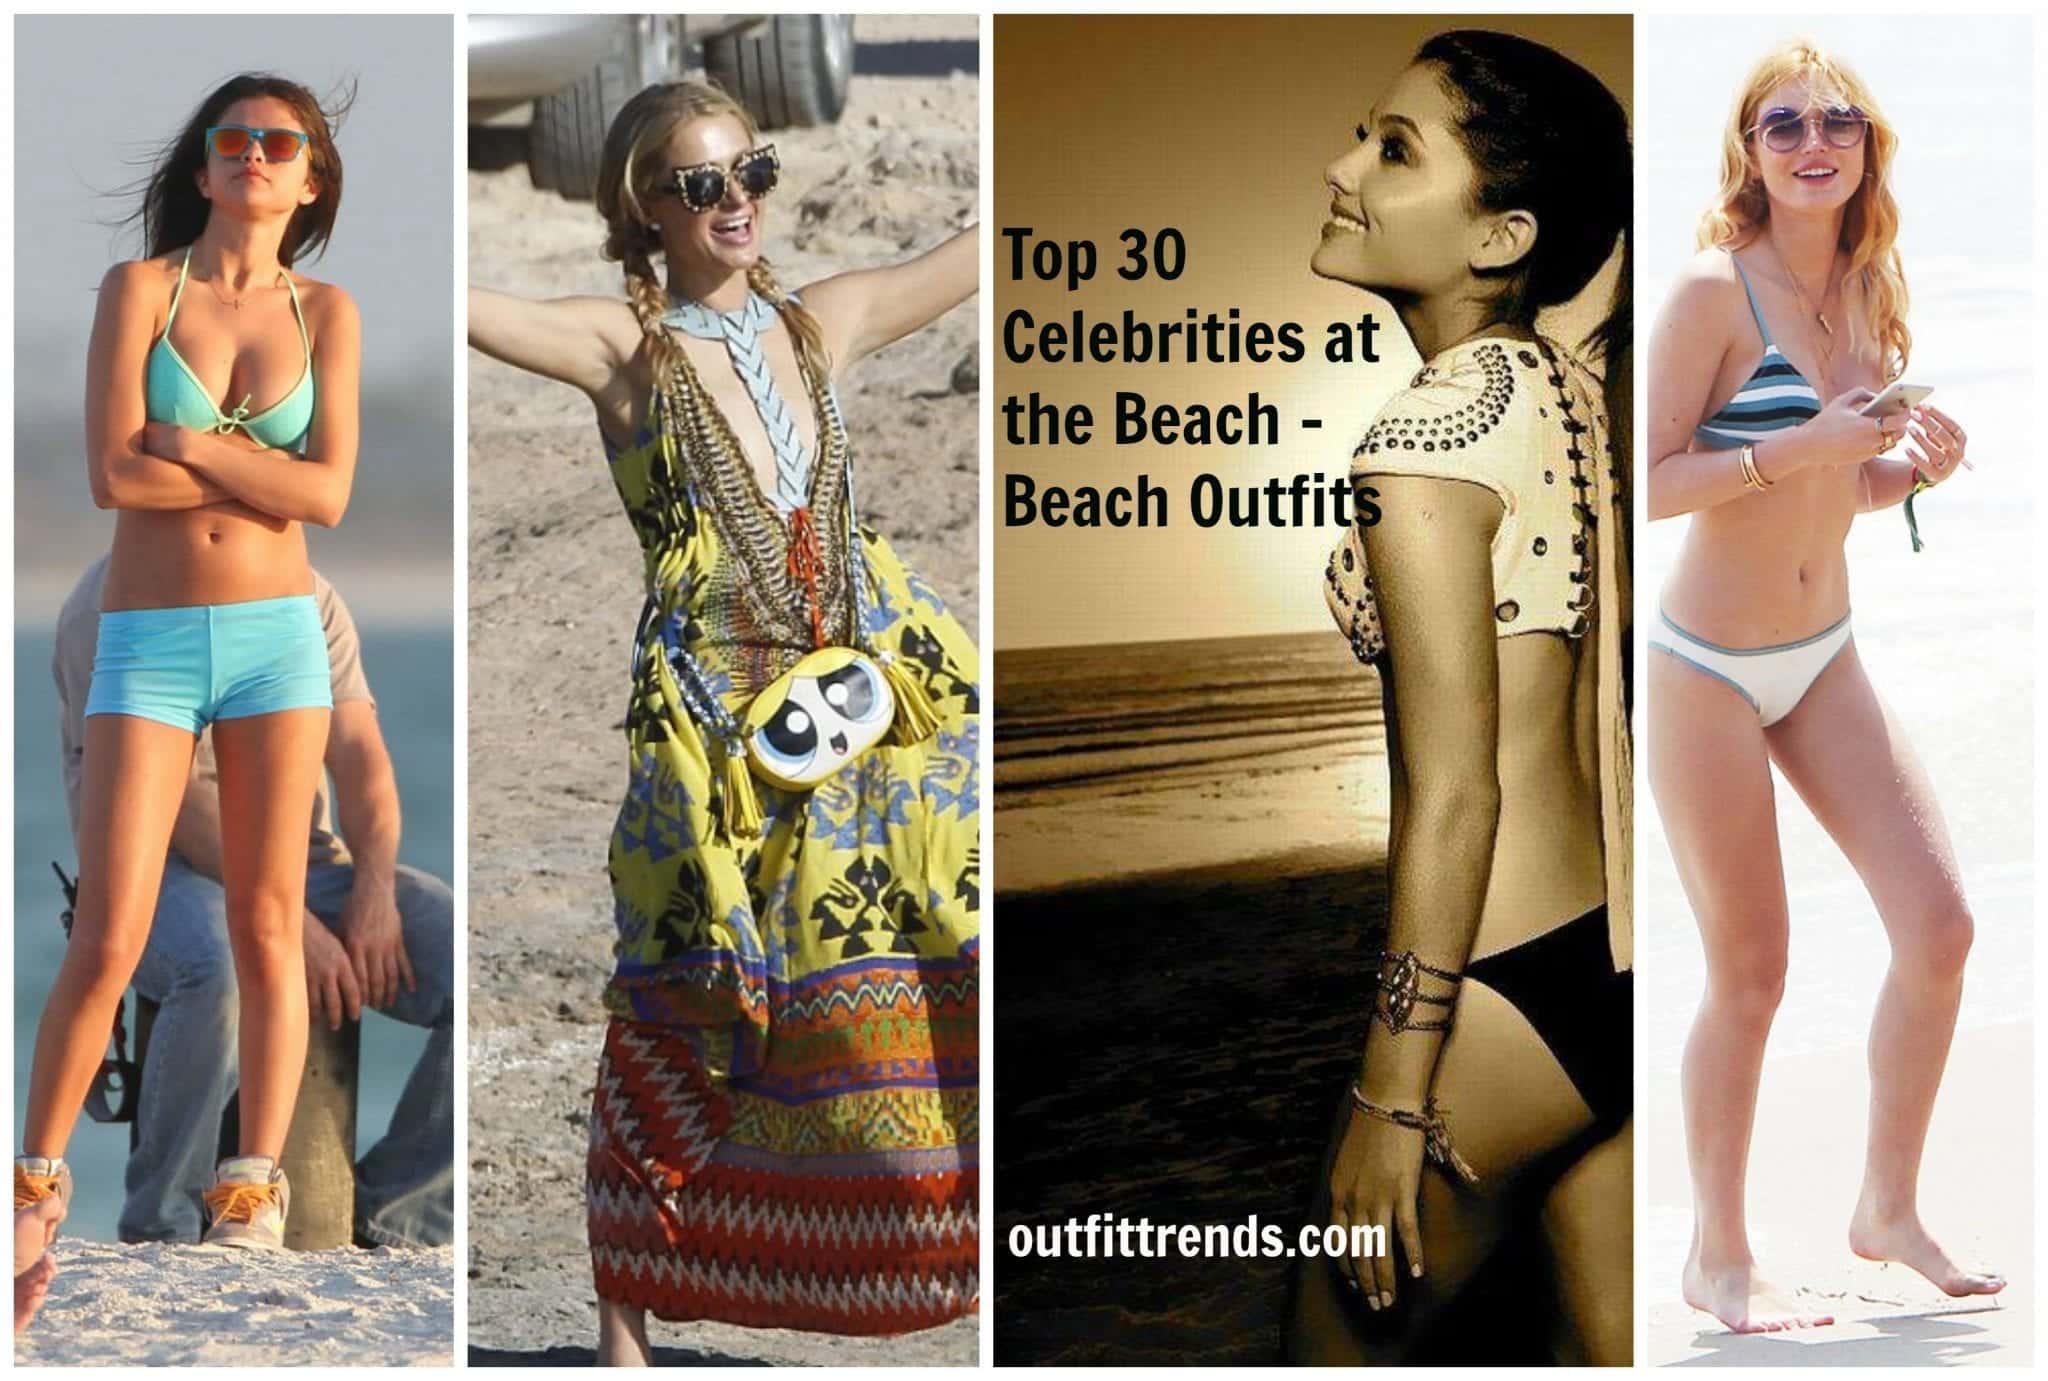 Hollywood Celebrities Beach Outfits-30 Top Celebs in Beachwear